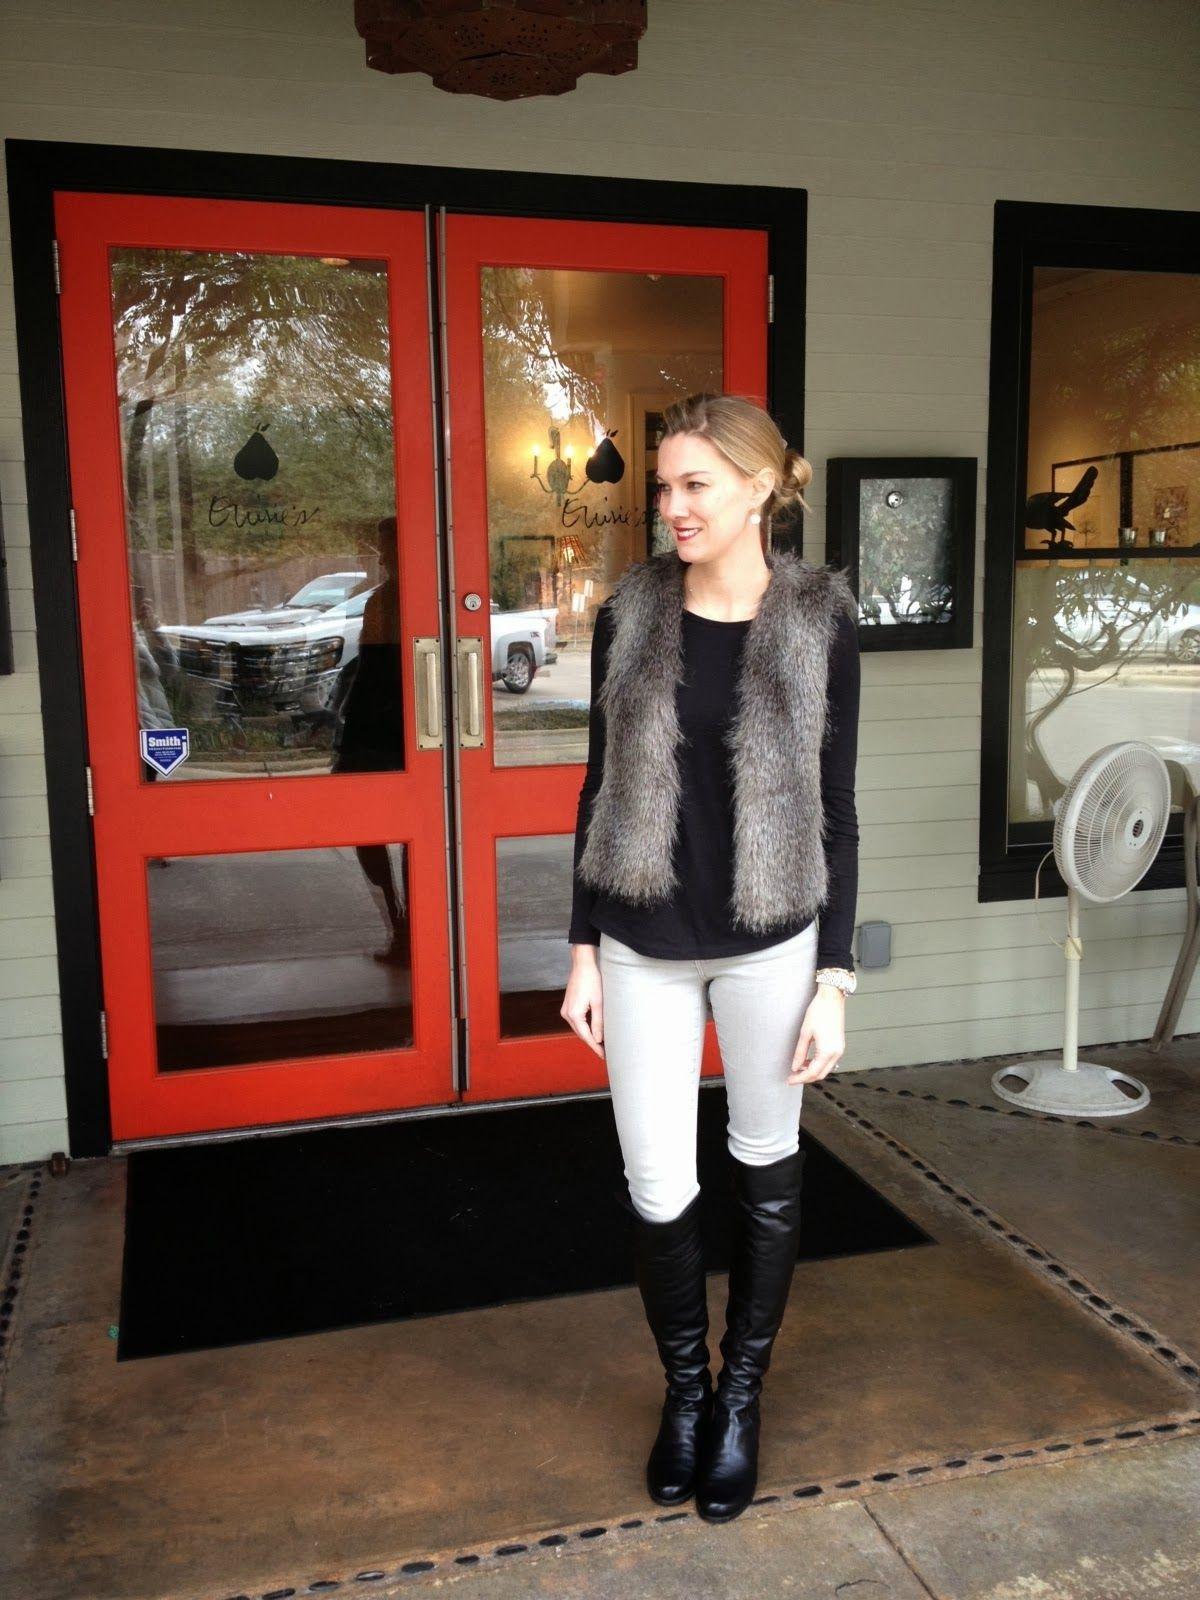 fc2974b831 Jersey negro + chaleco de pelos + pantalón blanco + botas altas negras